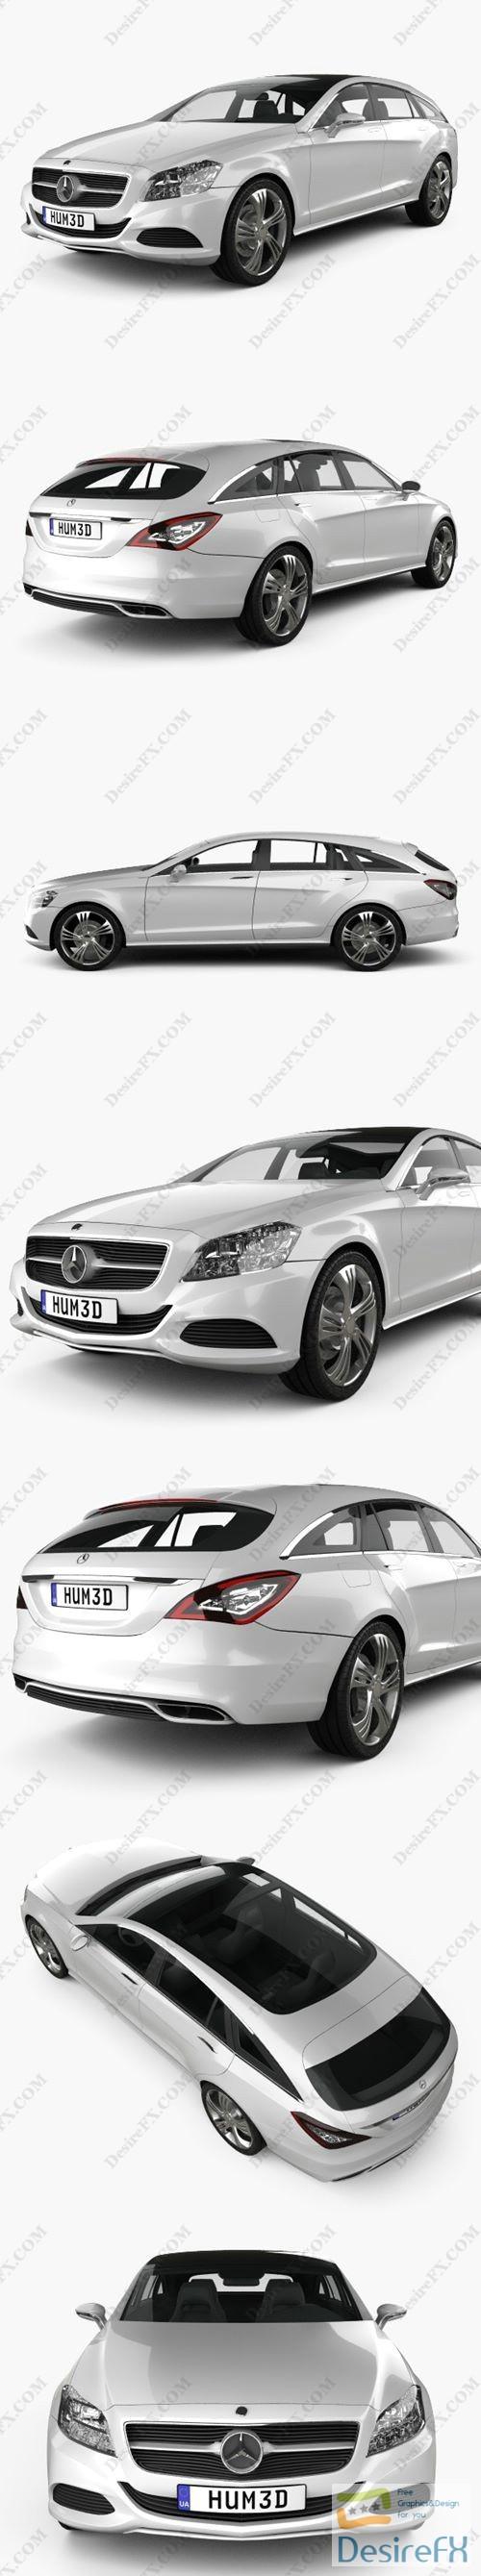 Mercedes-Benz Shooting Break concept 2011 3D Model